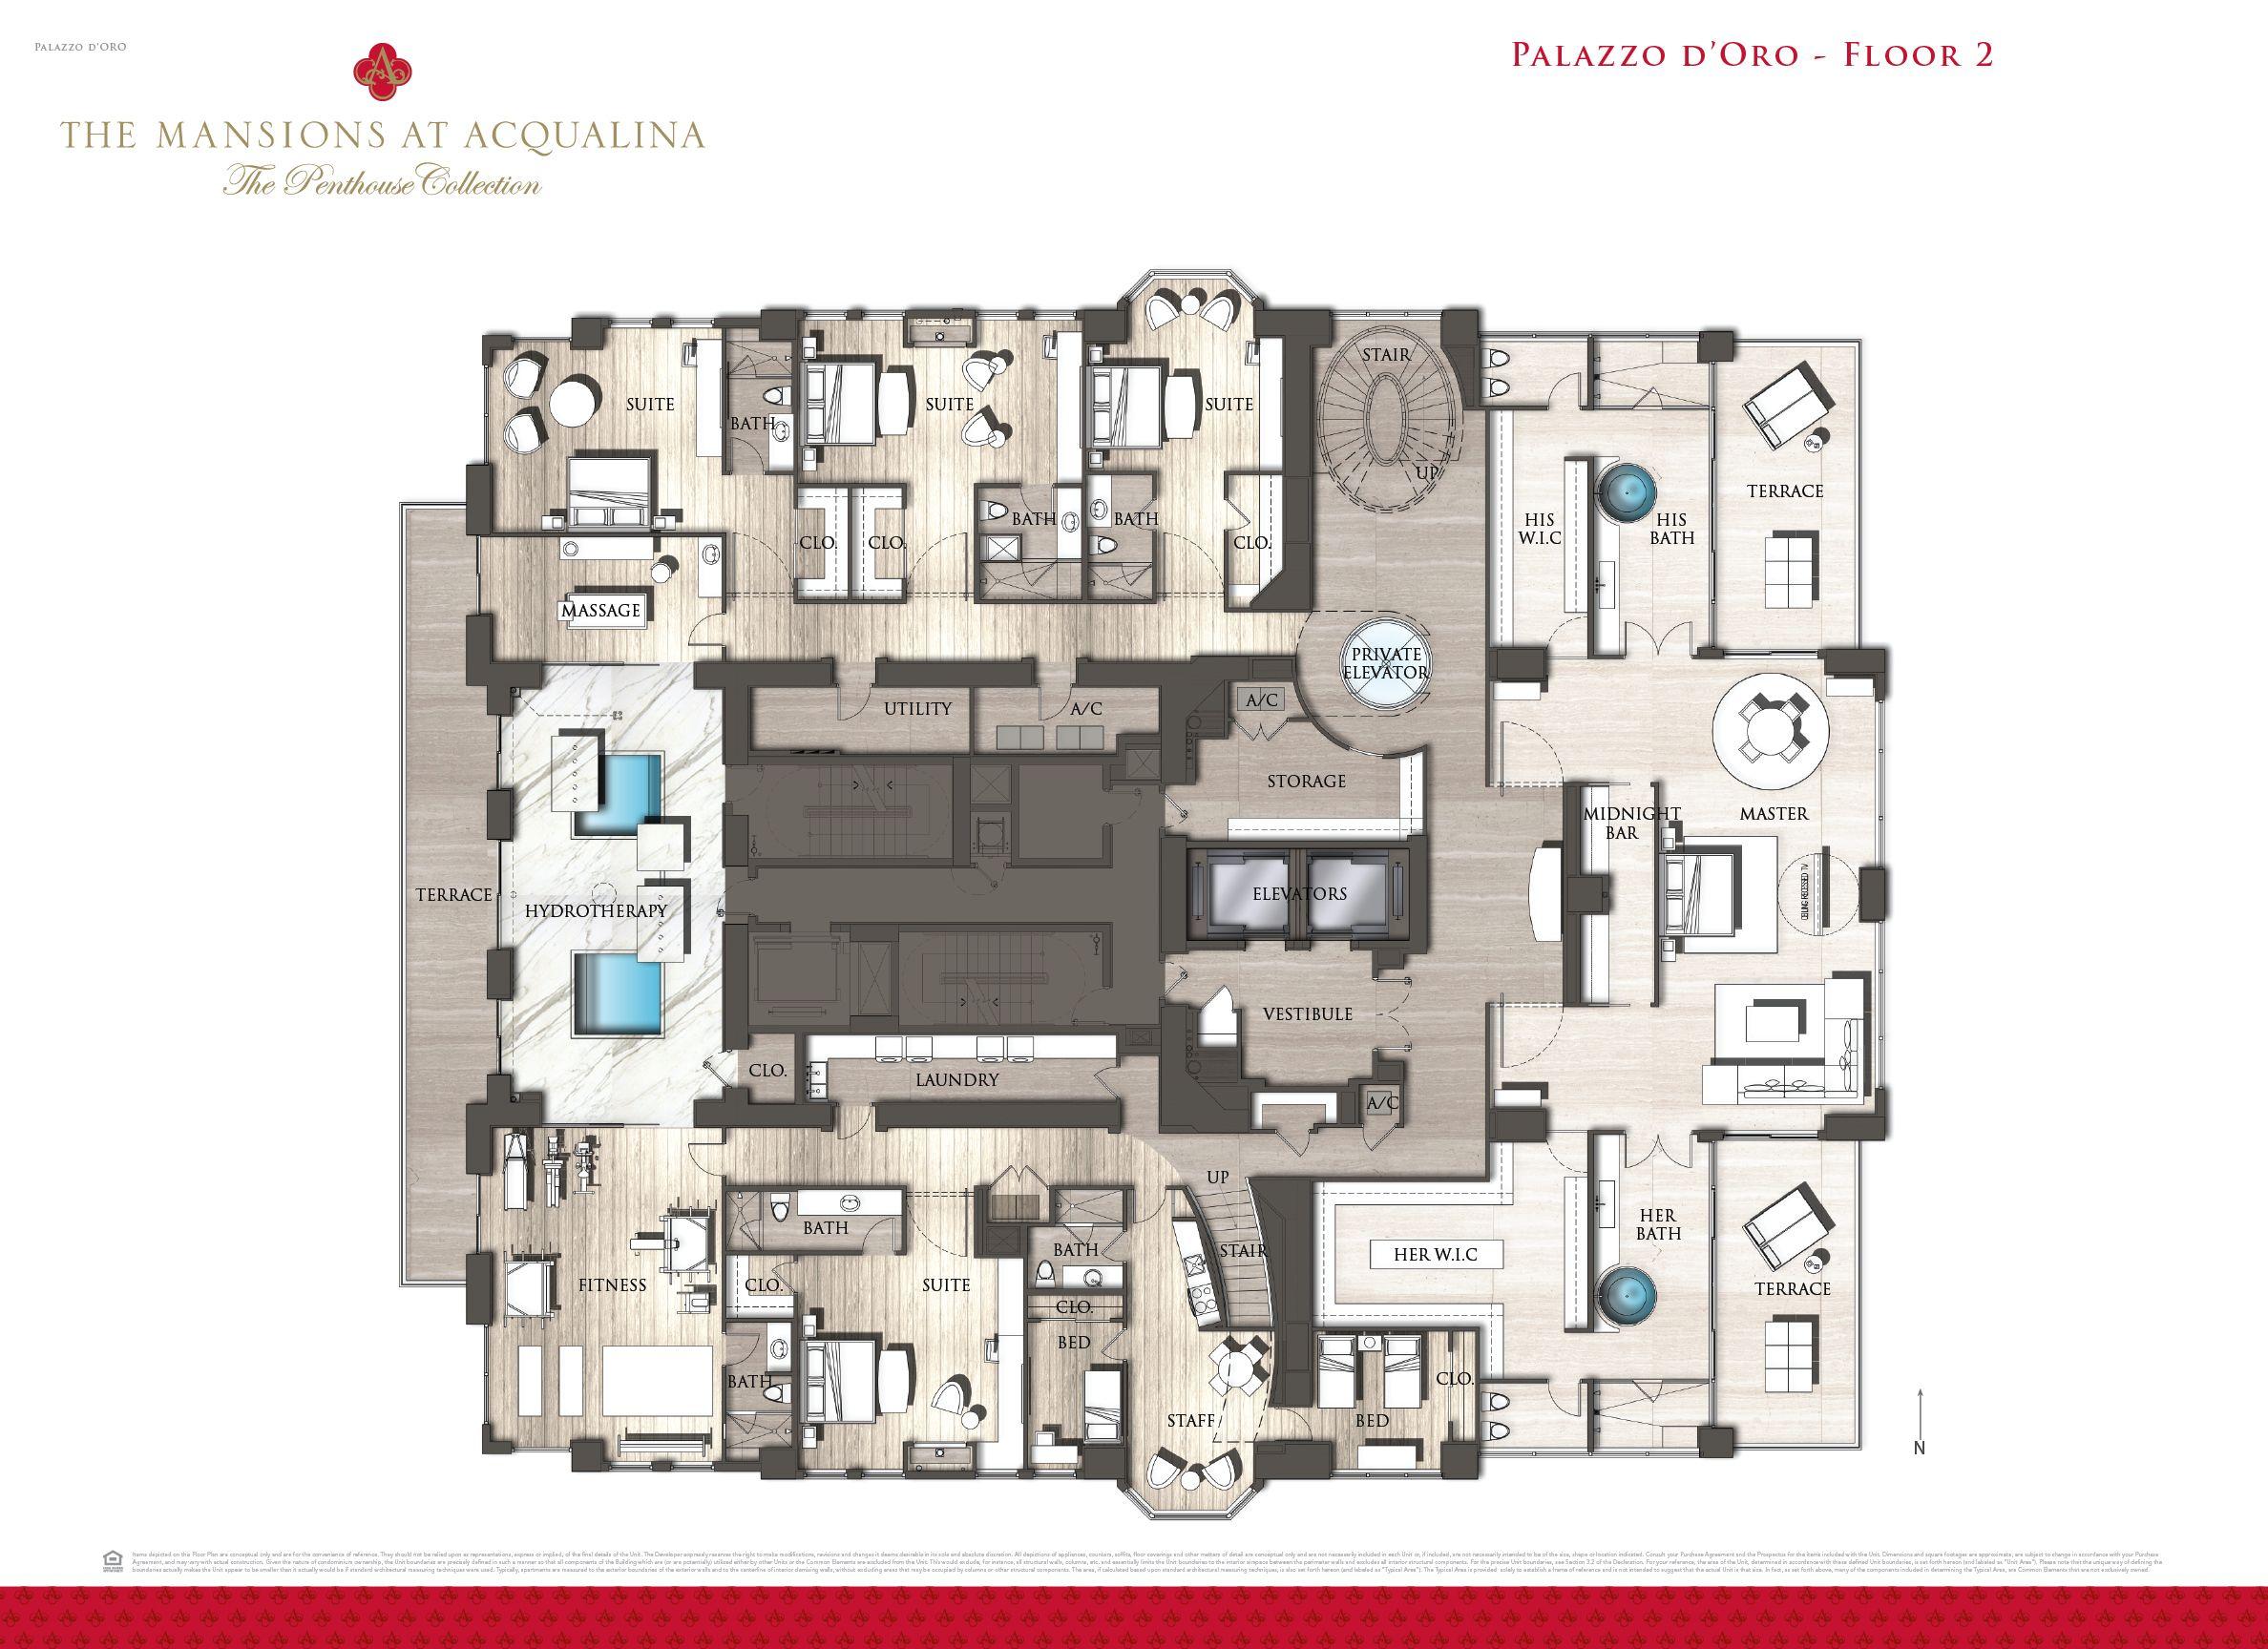 Penthouses for sale floor plans 121204 aqu floorplan penthouse v22 floor plan fanatic - Lay outs penthouse ...